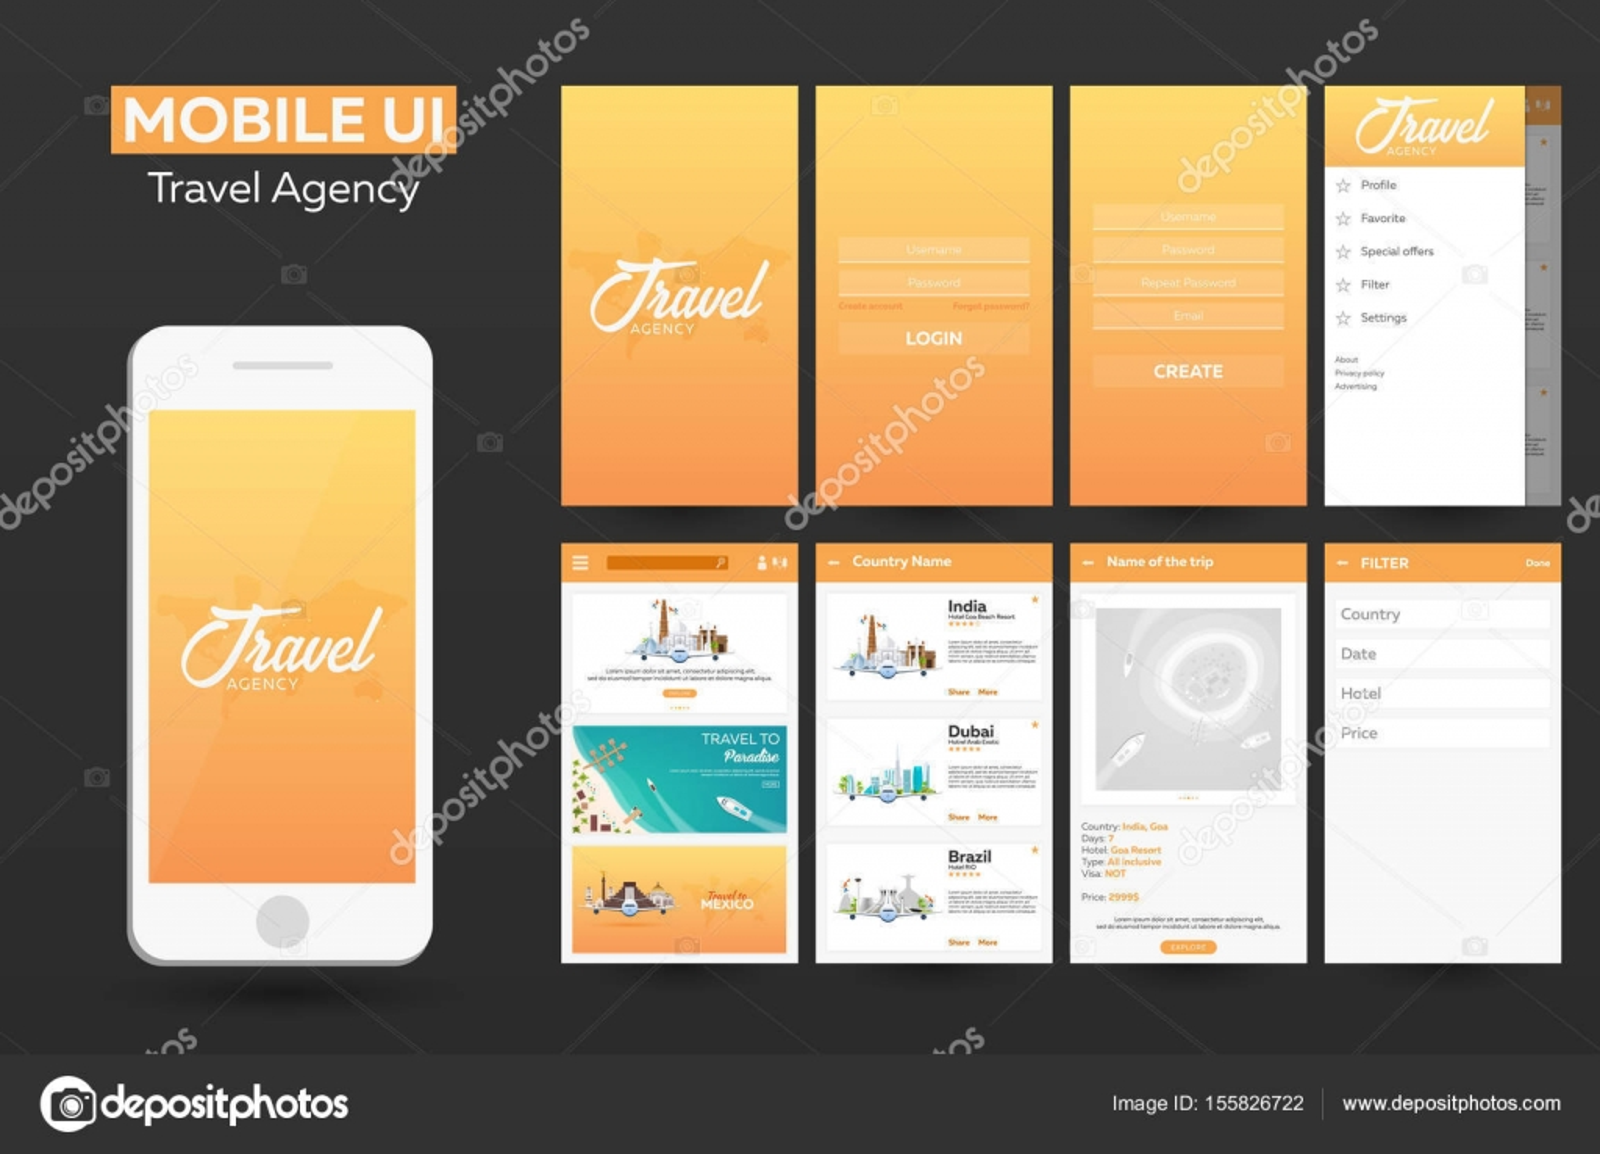 Mobile app Travel agency Material Design UI, UX, GUI